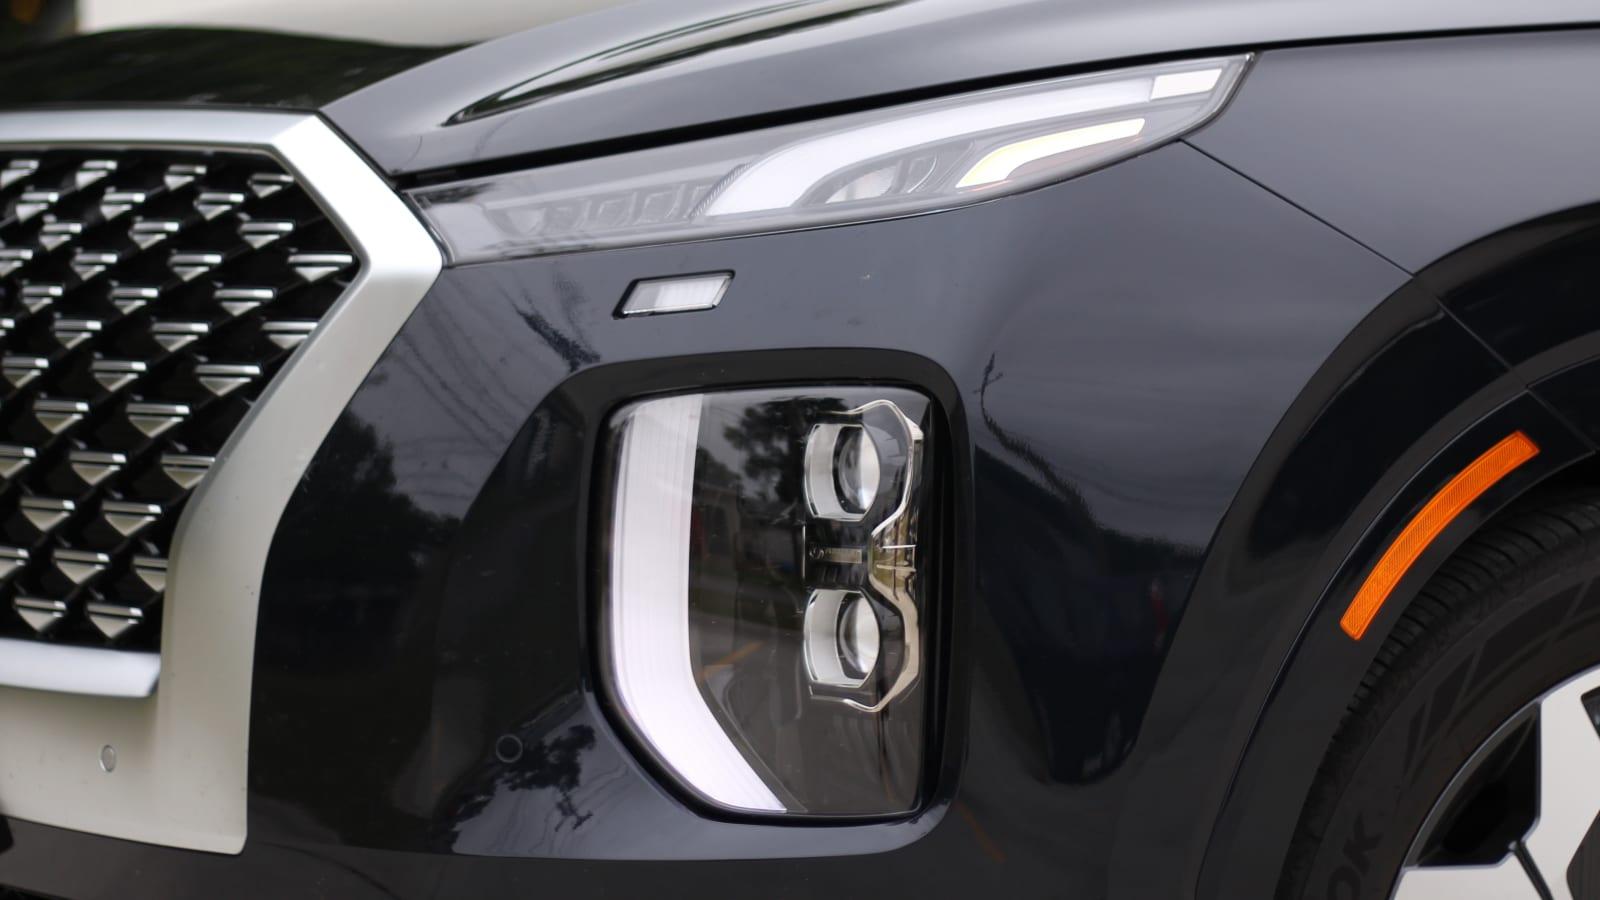 2021 Hyundai Palisade Langfristiges Update€